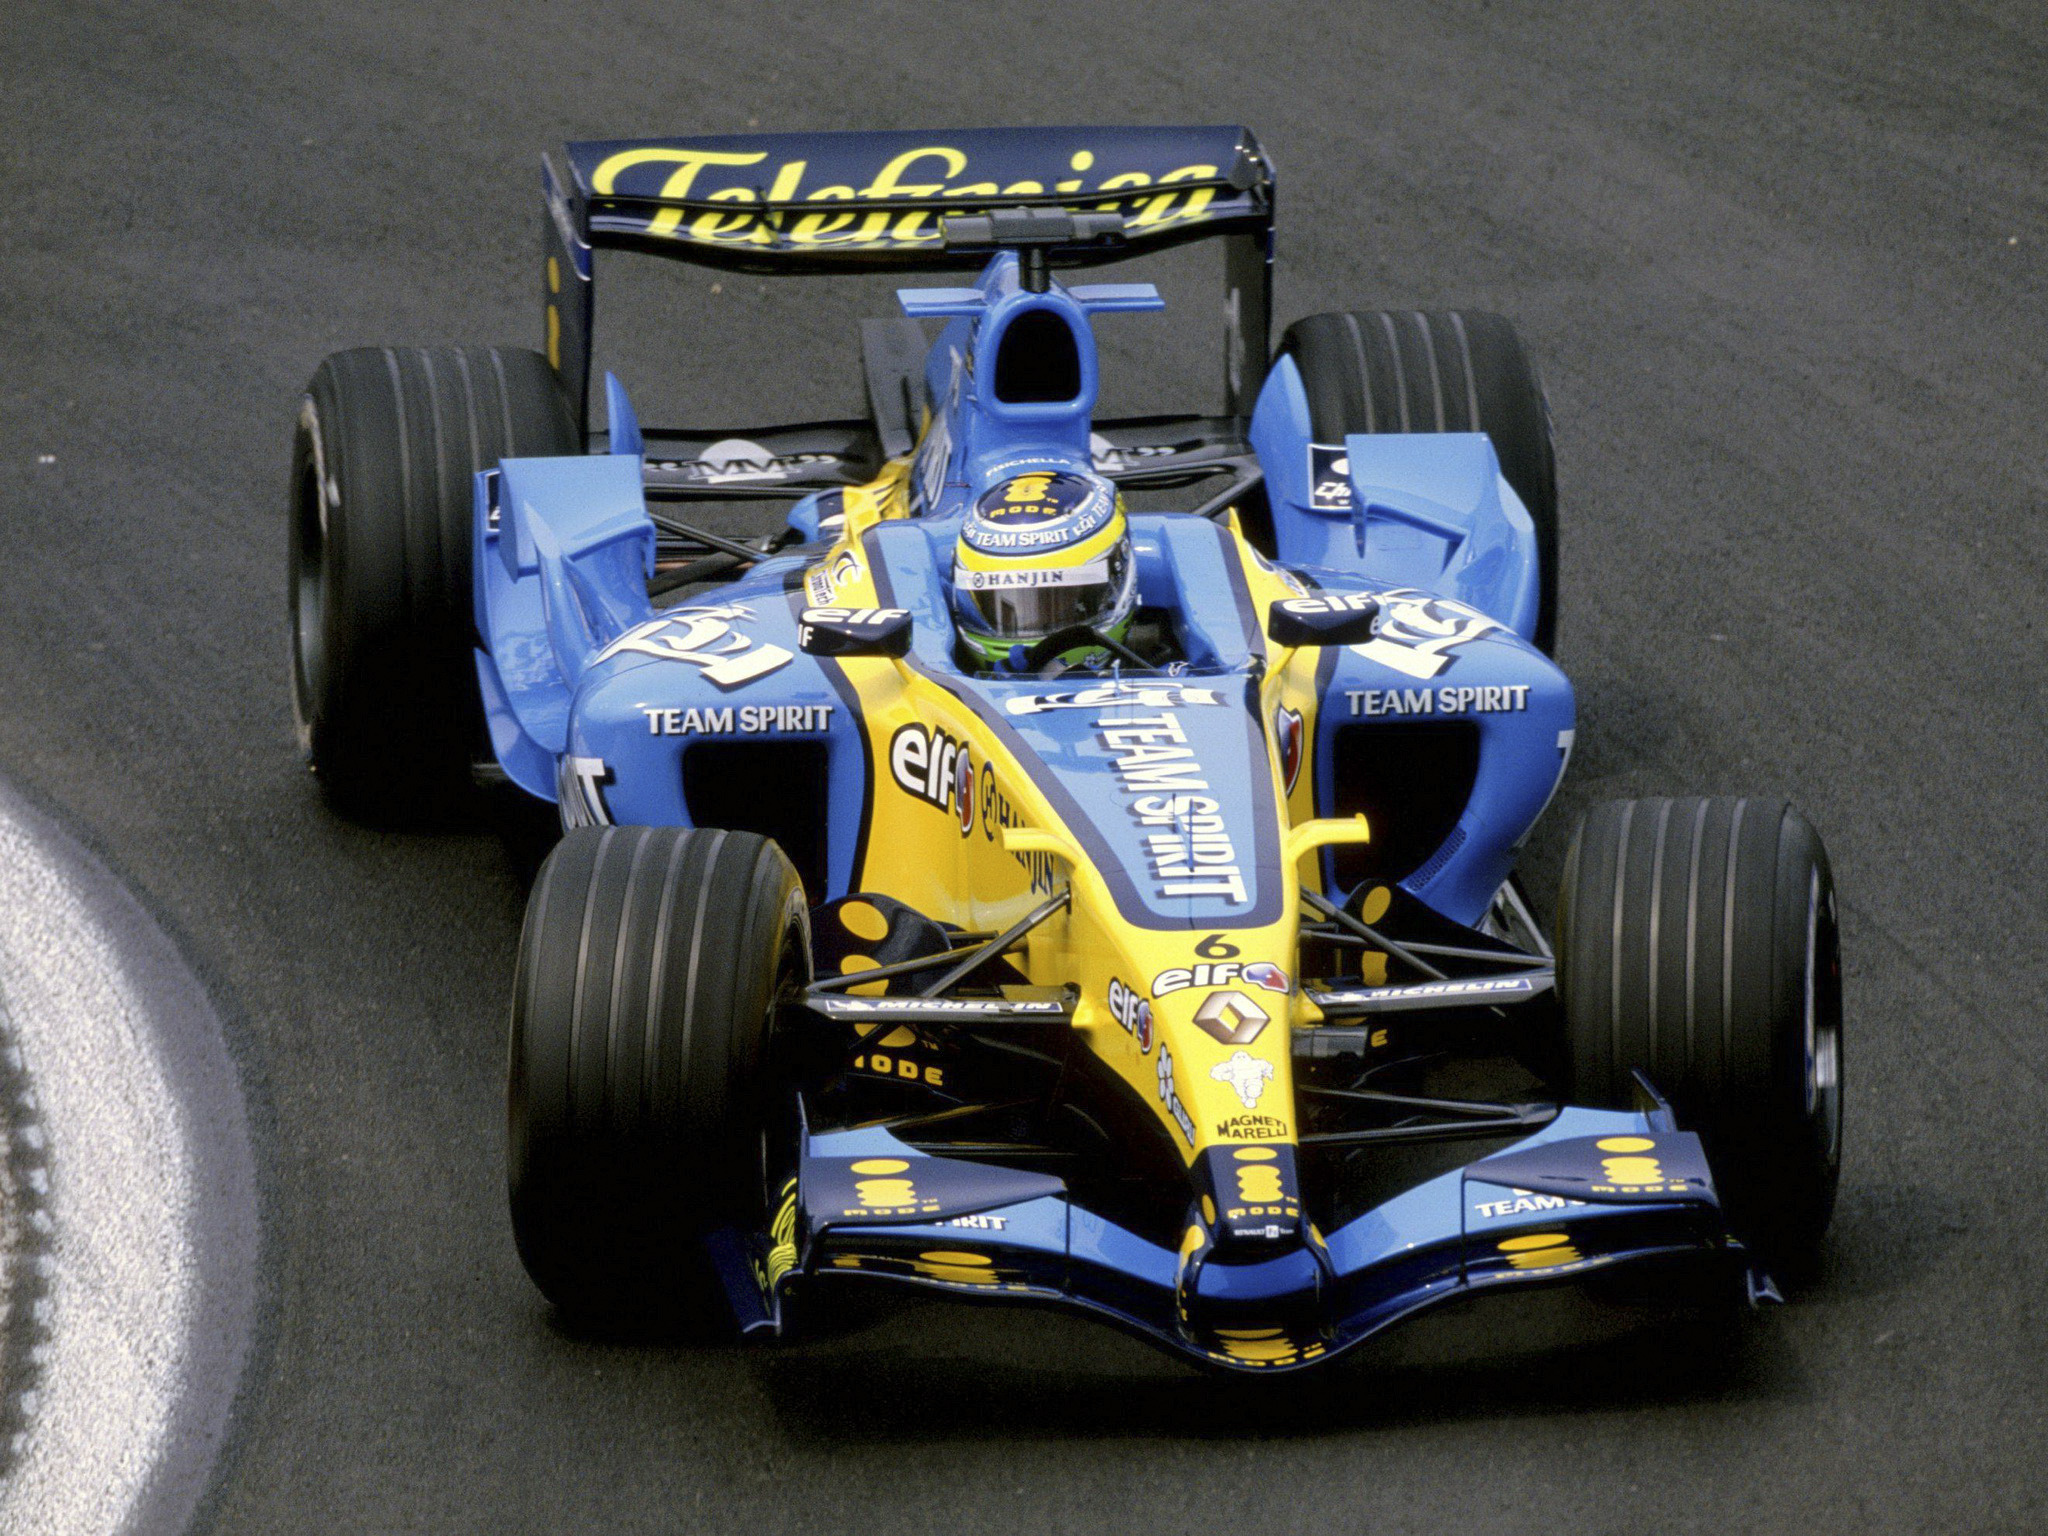 Renault R25 F1